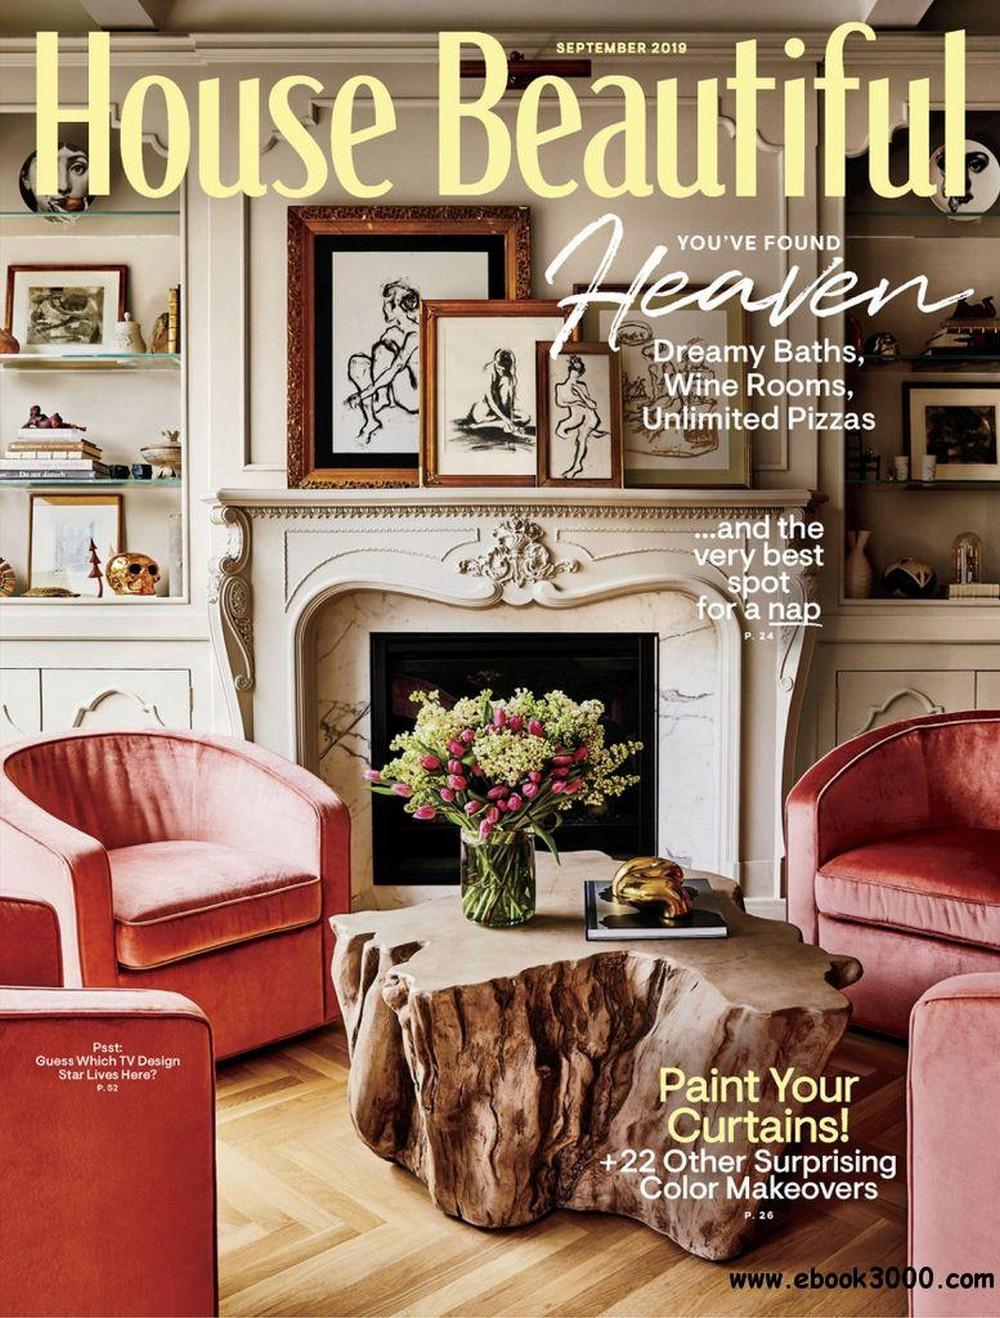 Find The 10 Best Interior Design Magazines For September! interior design magazines Find The 10  Best Interior Design Magazines For September! Find The 10 Best Interior Design Magazines For September 7